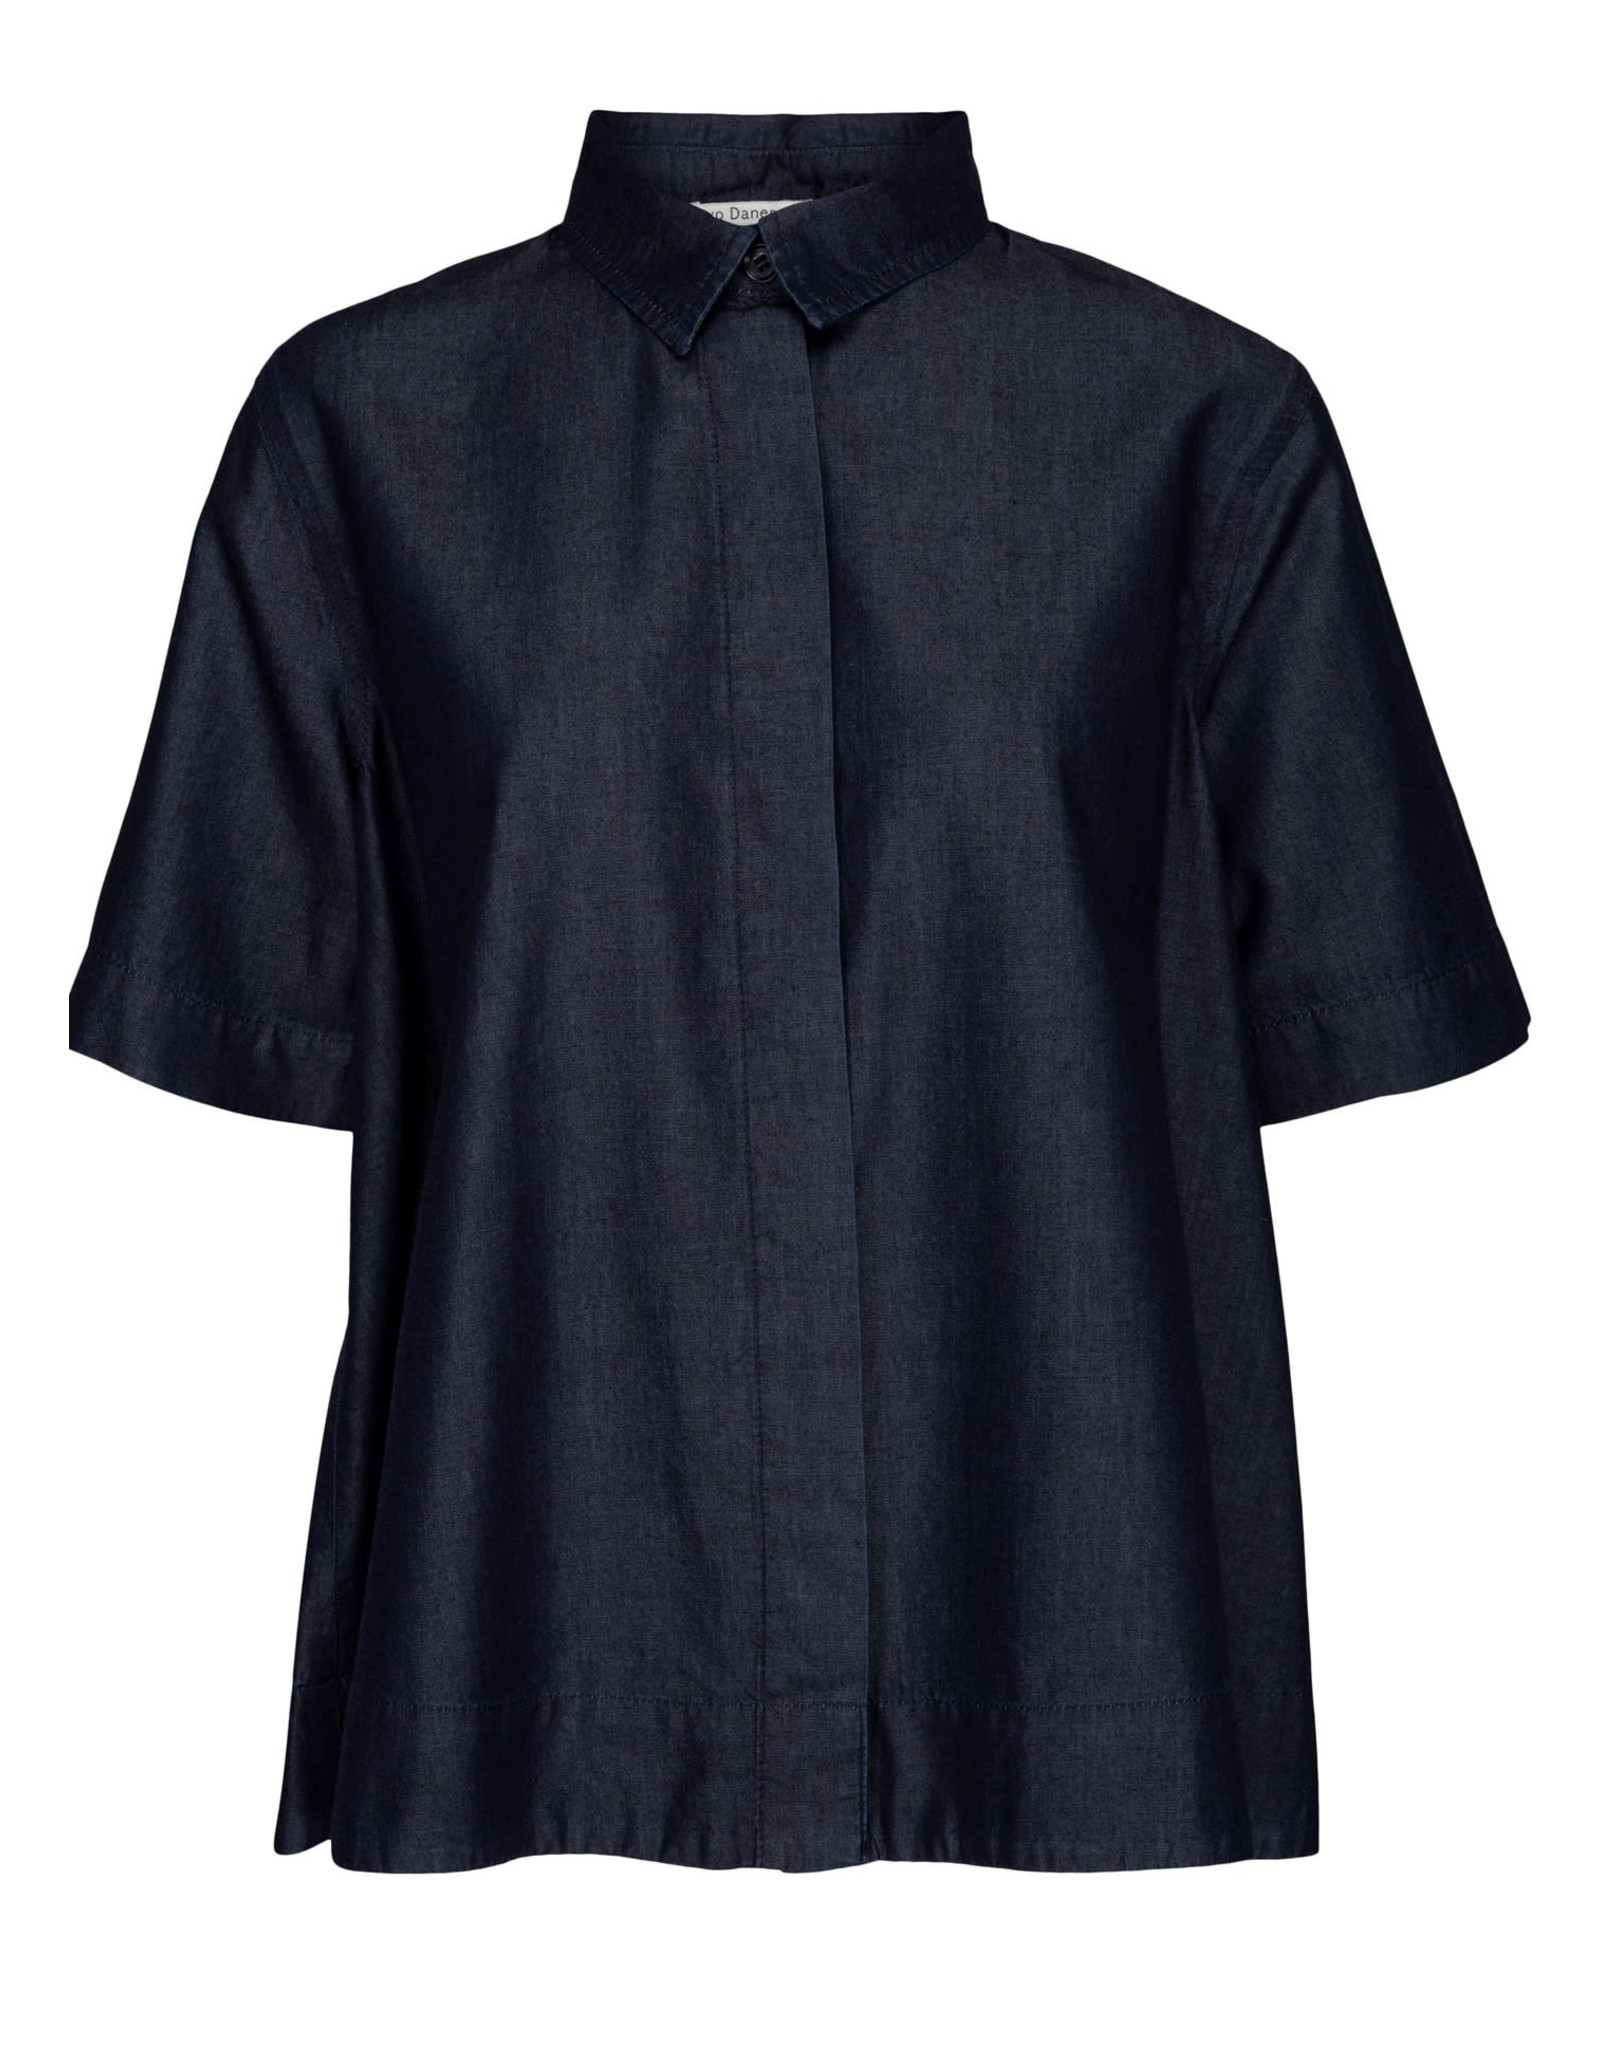 TWO DANES 37544 368 Darcy cotton tencel shirt